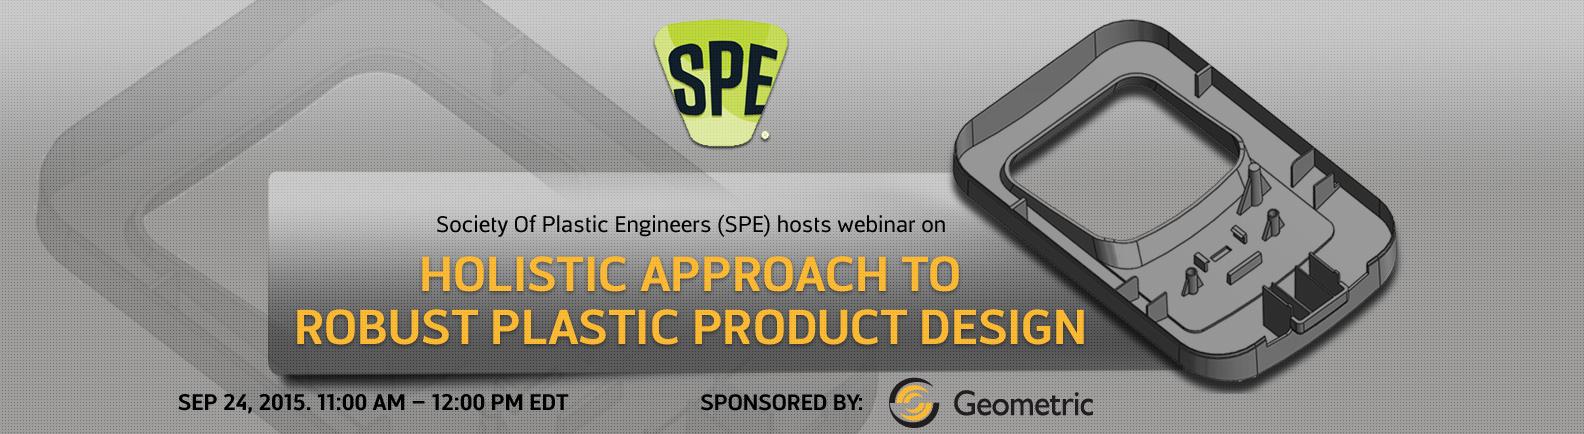 Robust-Plastic-Part-Design-SPE-Webinar.j